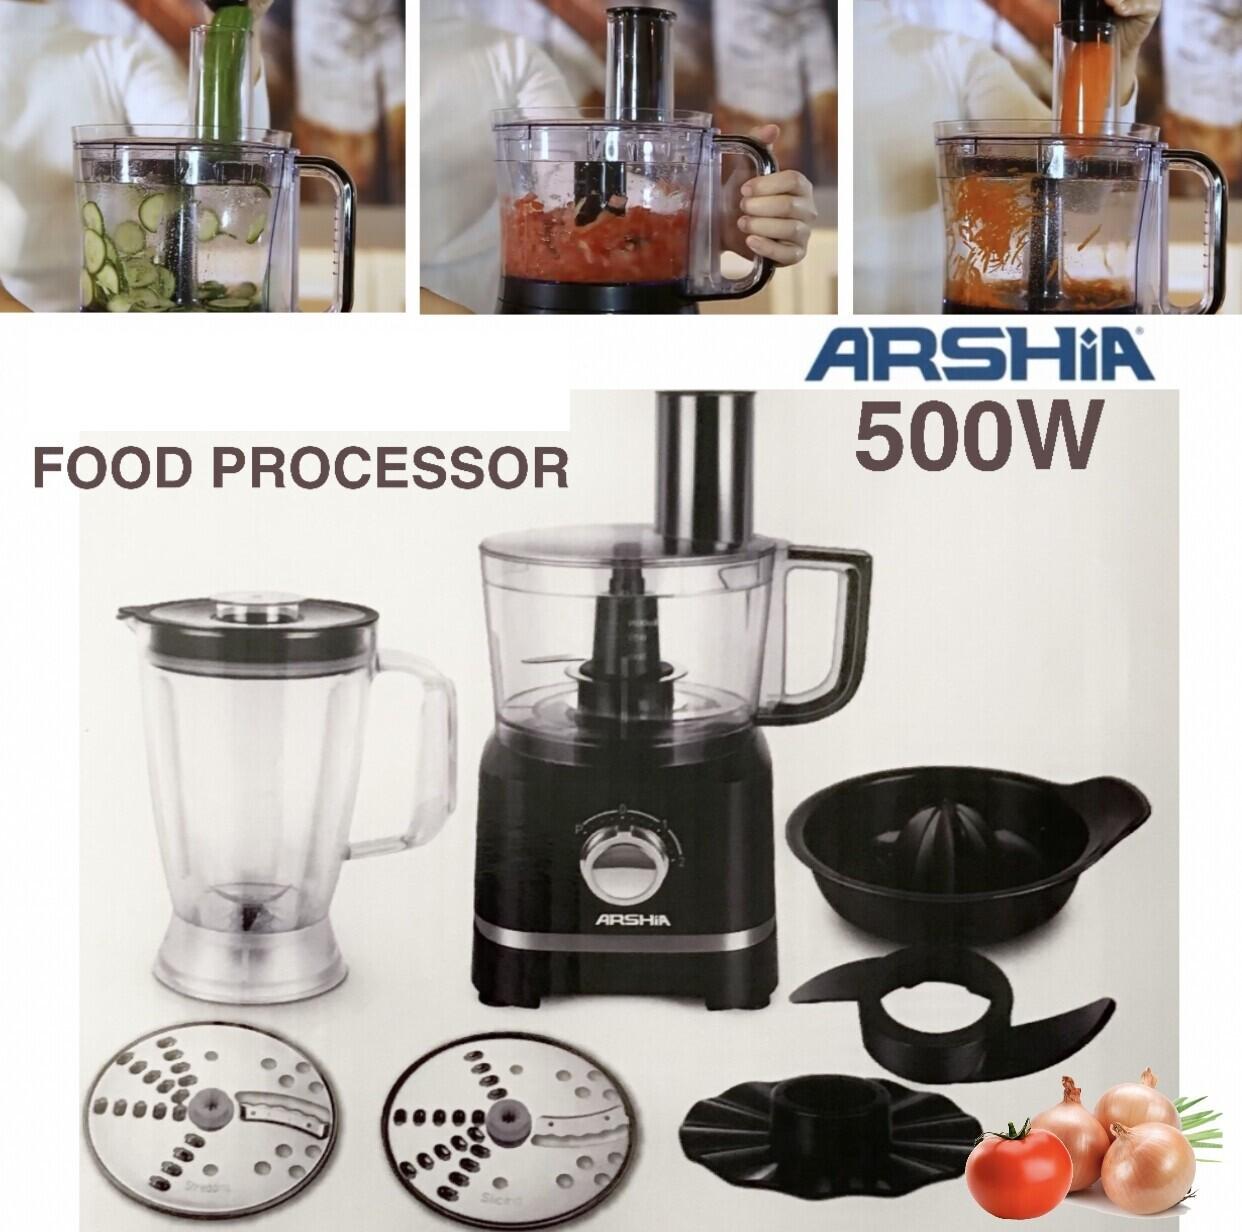 ARSHIA Food Processor